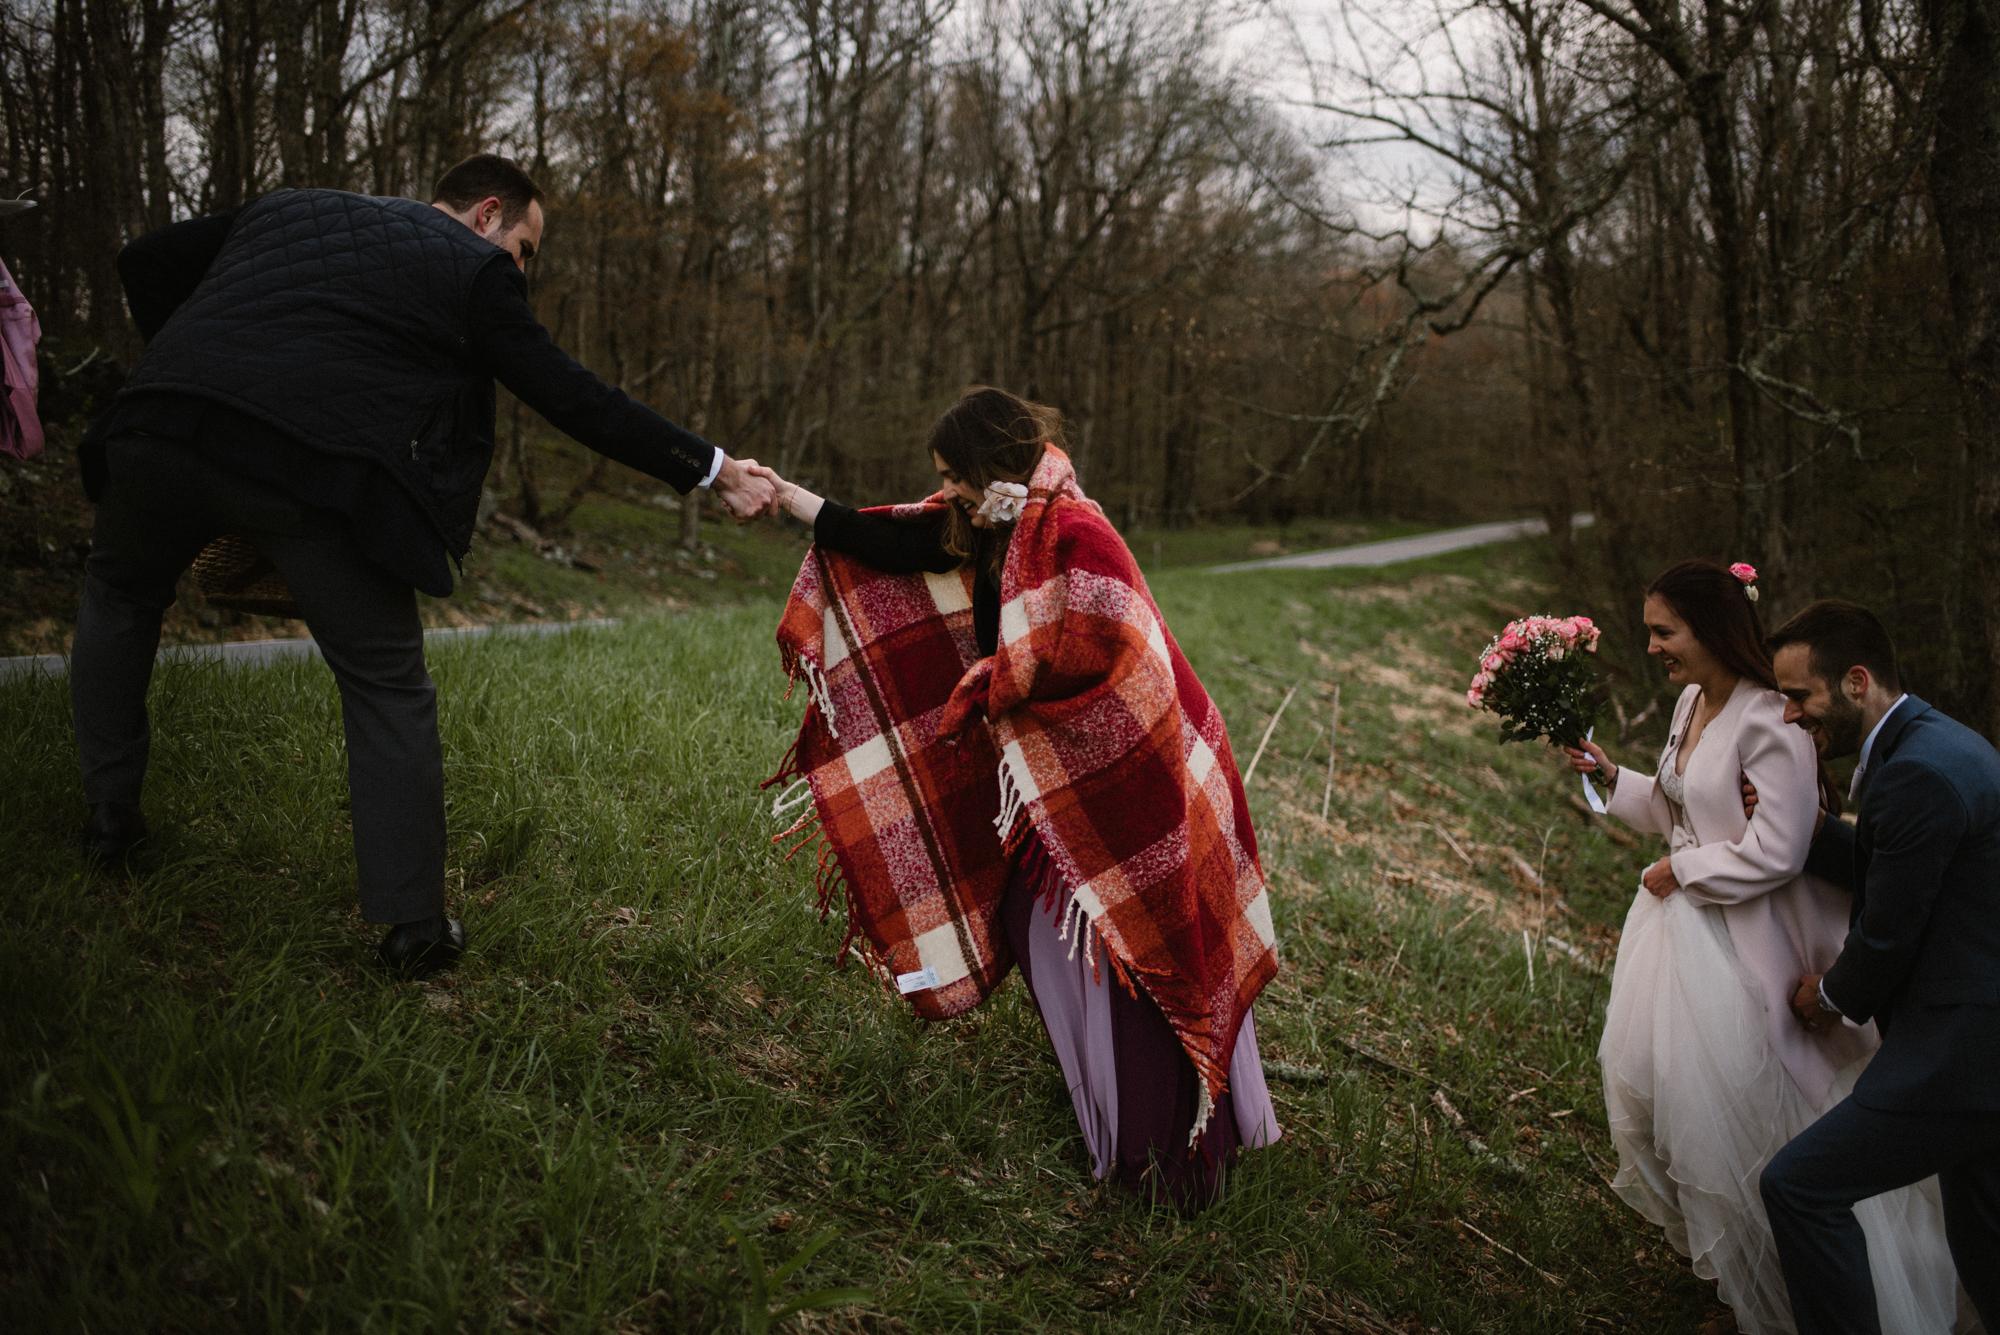 Paula and Andrew - Small Adventurous Wedding in Shenandoah National Park - Blue Ridge Mountain Wedding - White Sails Creative - Mountain Elopement_31.jpg